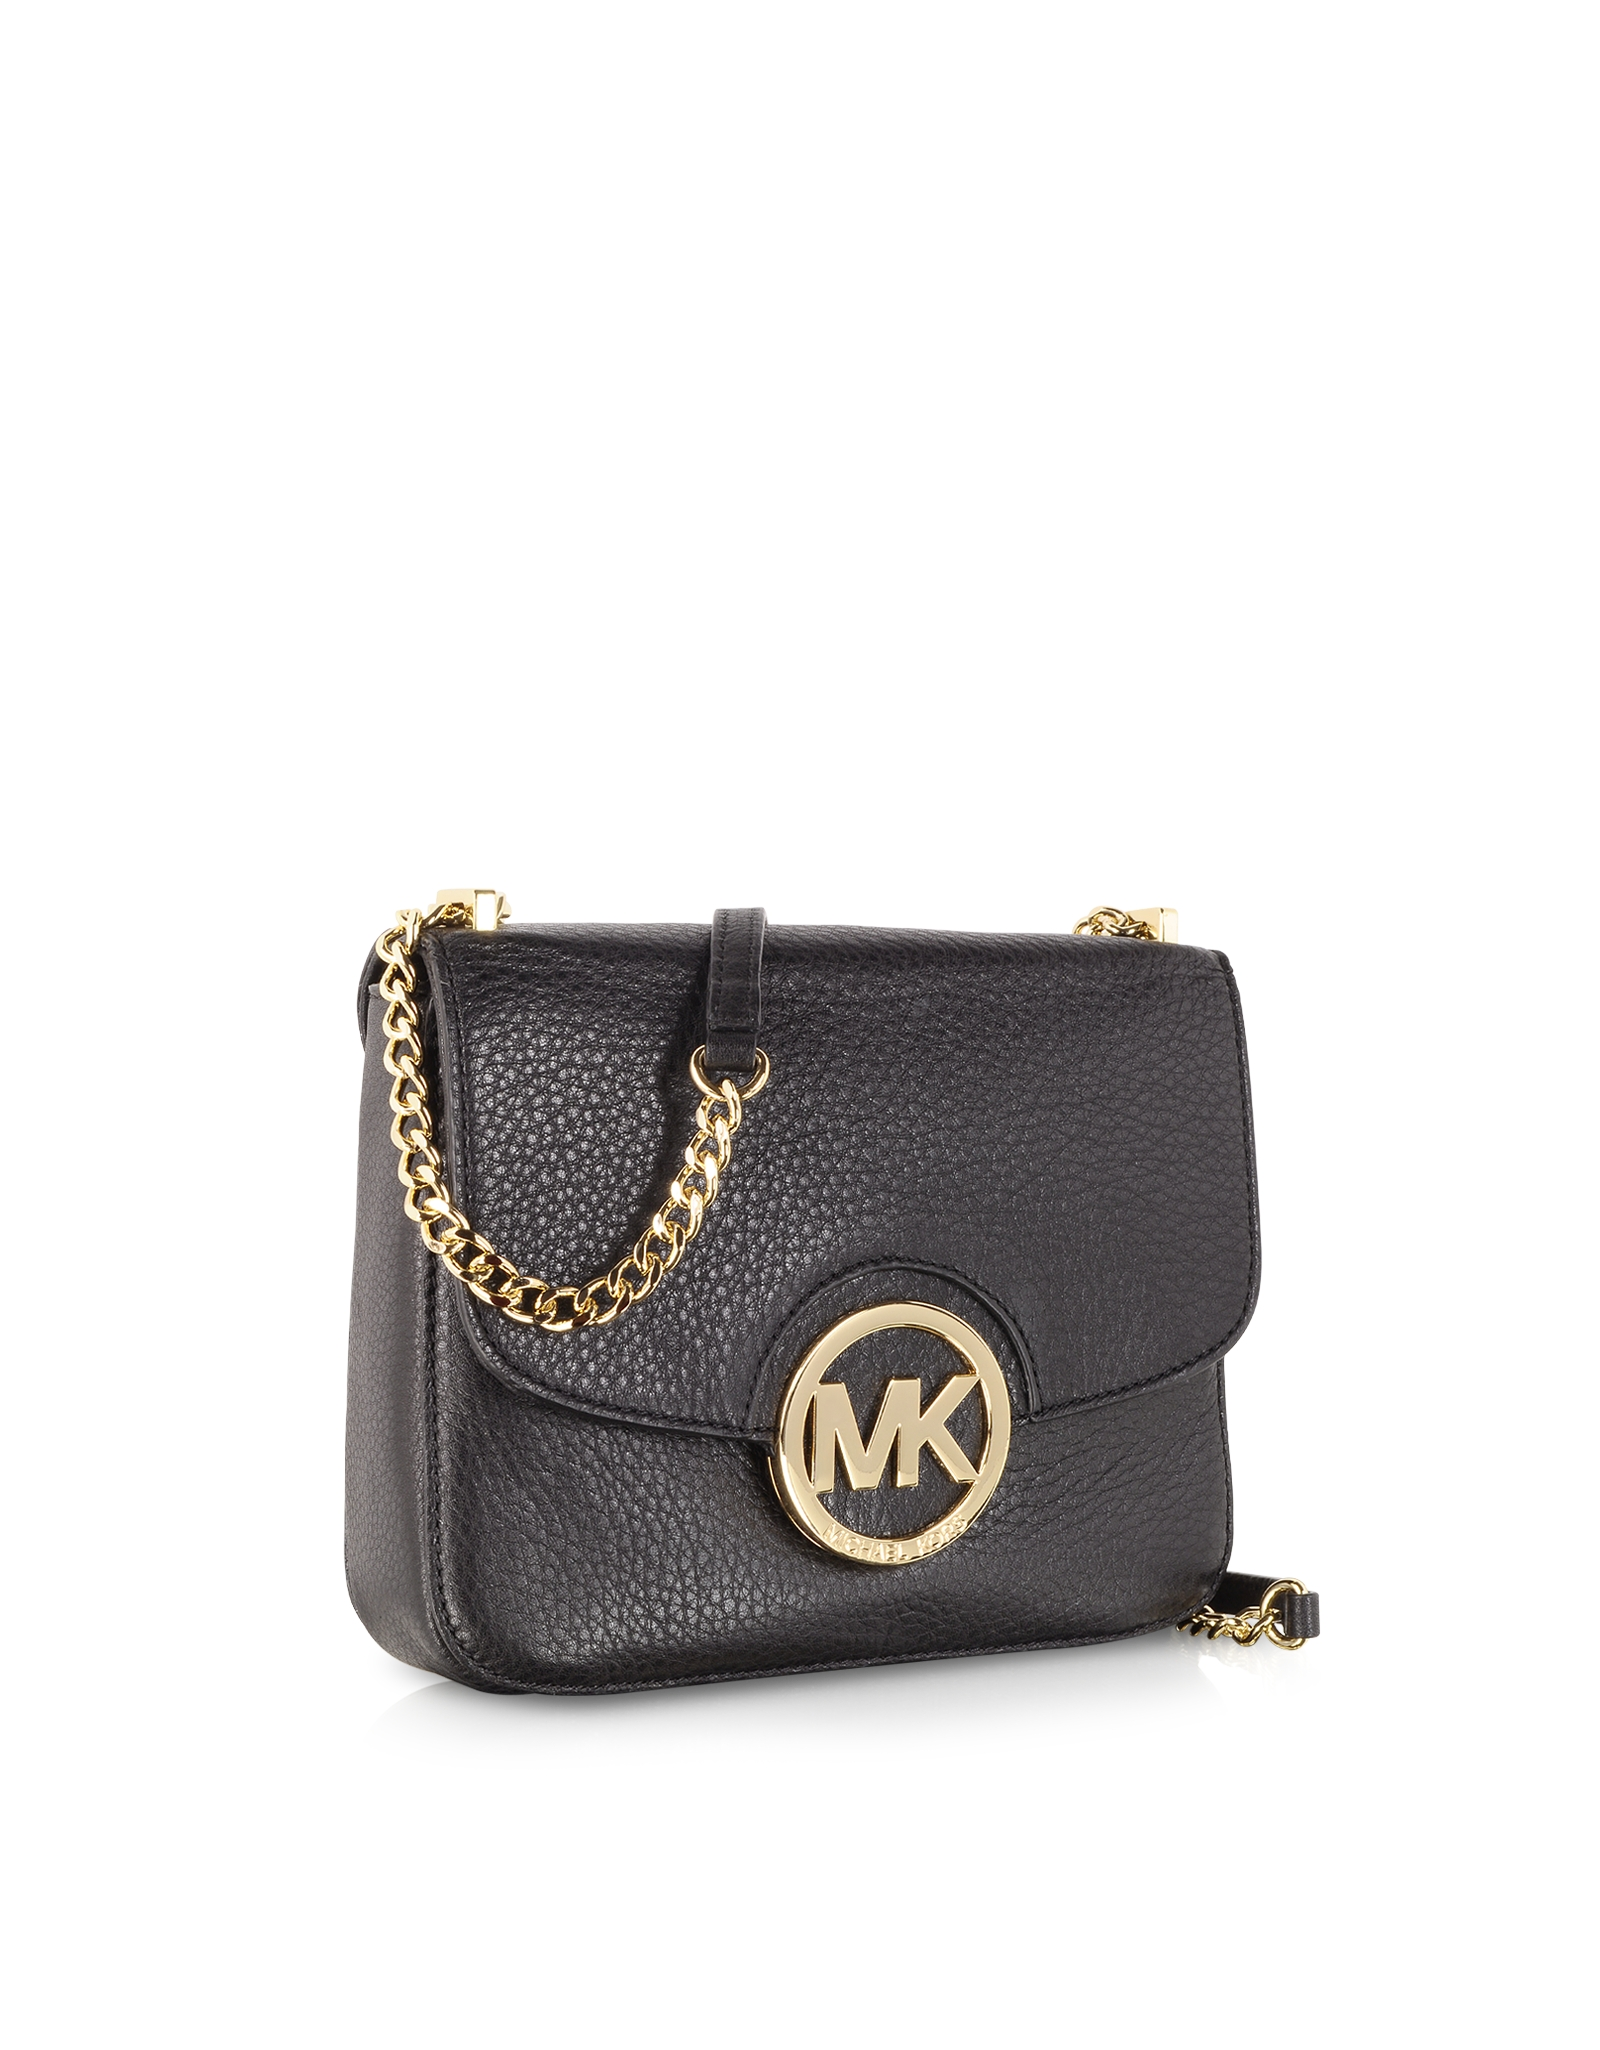 5c745c5720a9 Lyst - Michael Kors Fulton Mini Plebbed Leather Shoulder Bag in Black